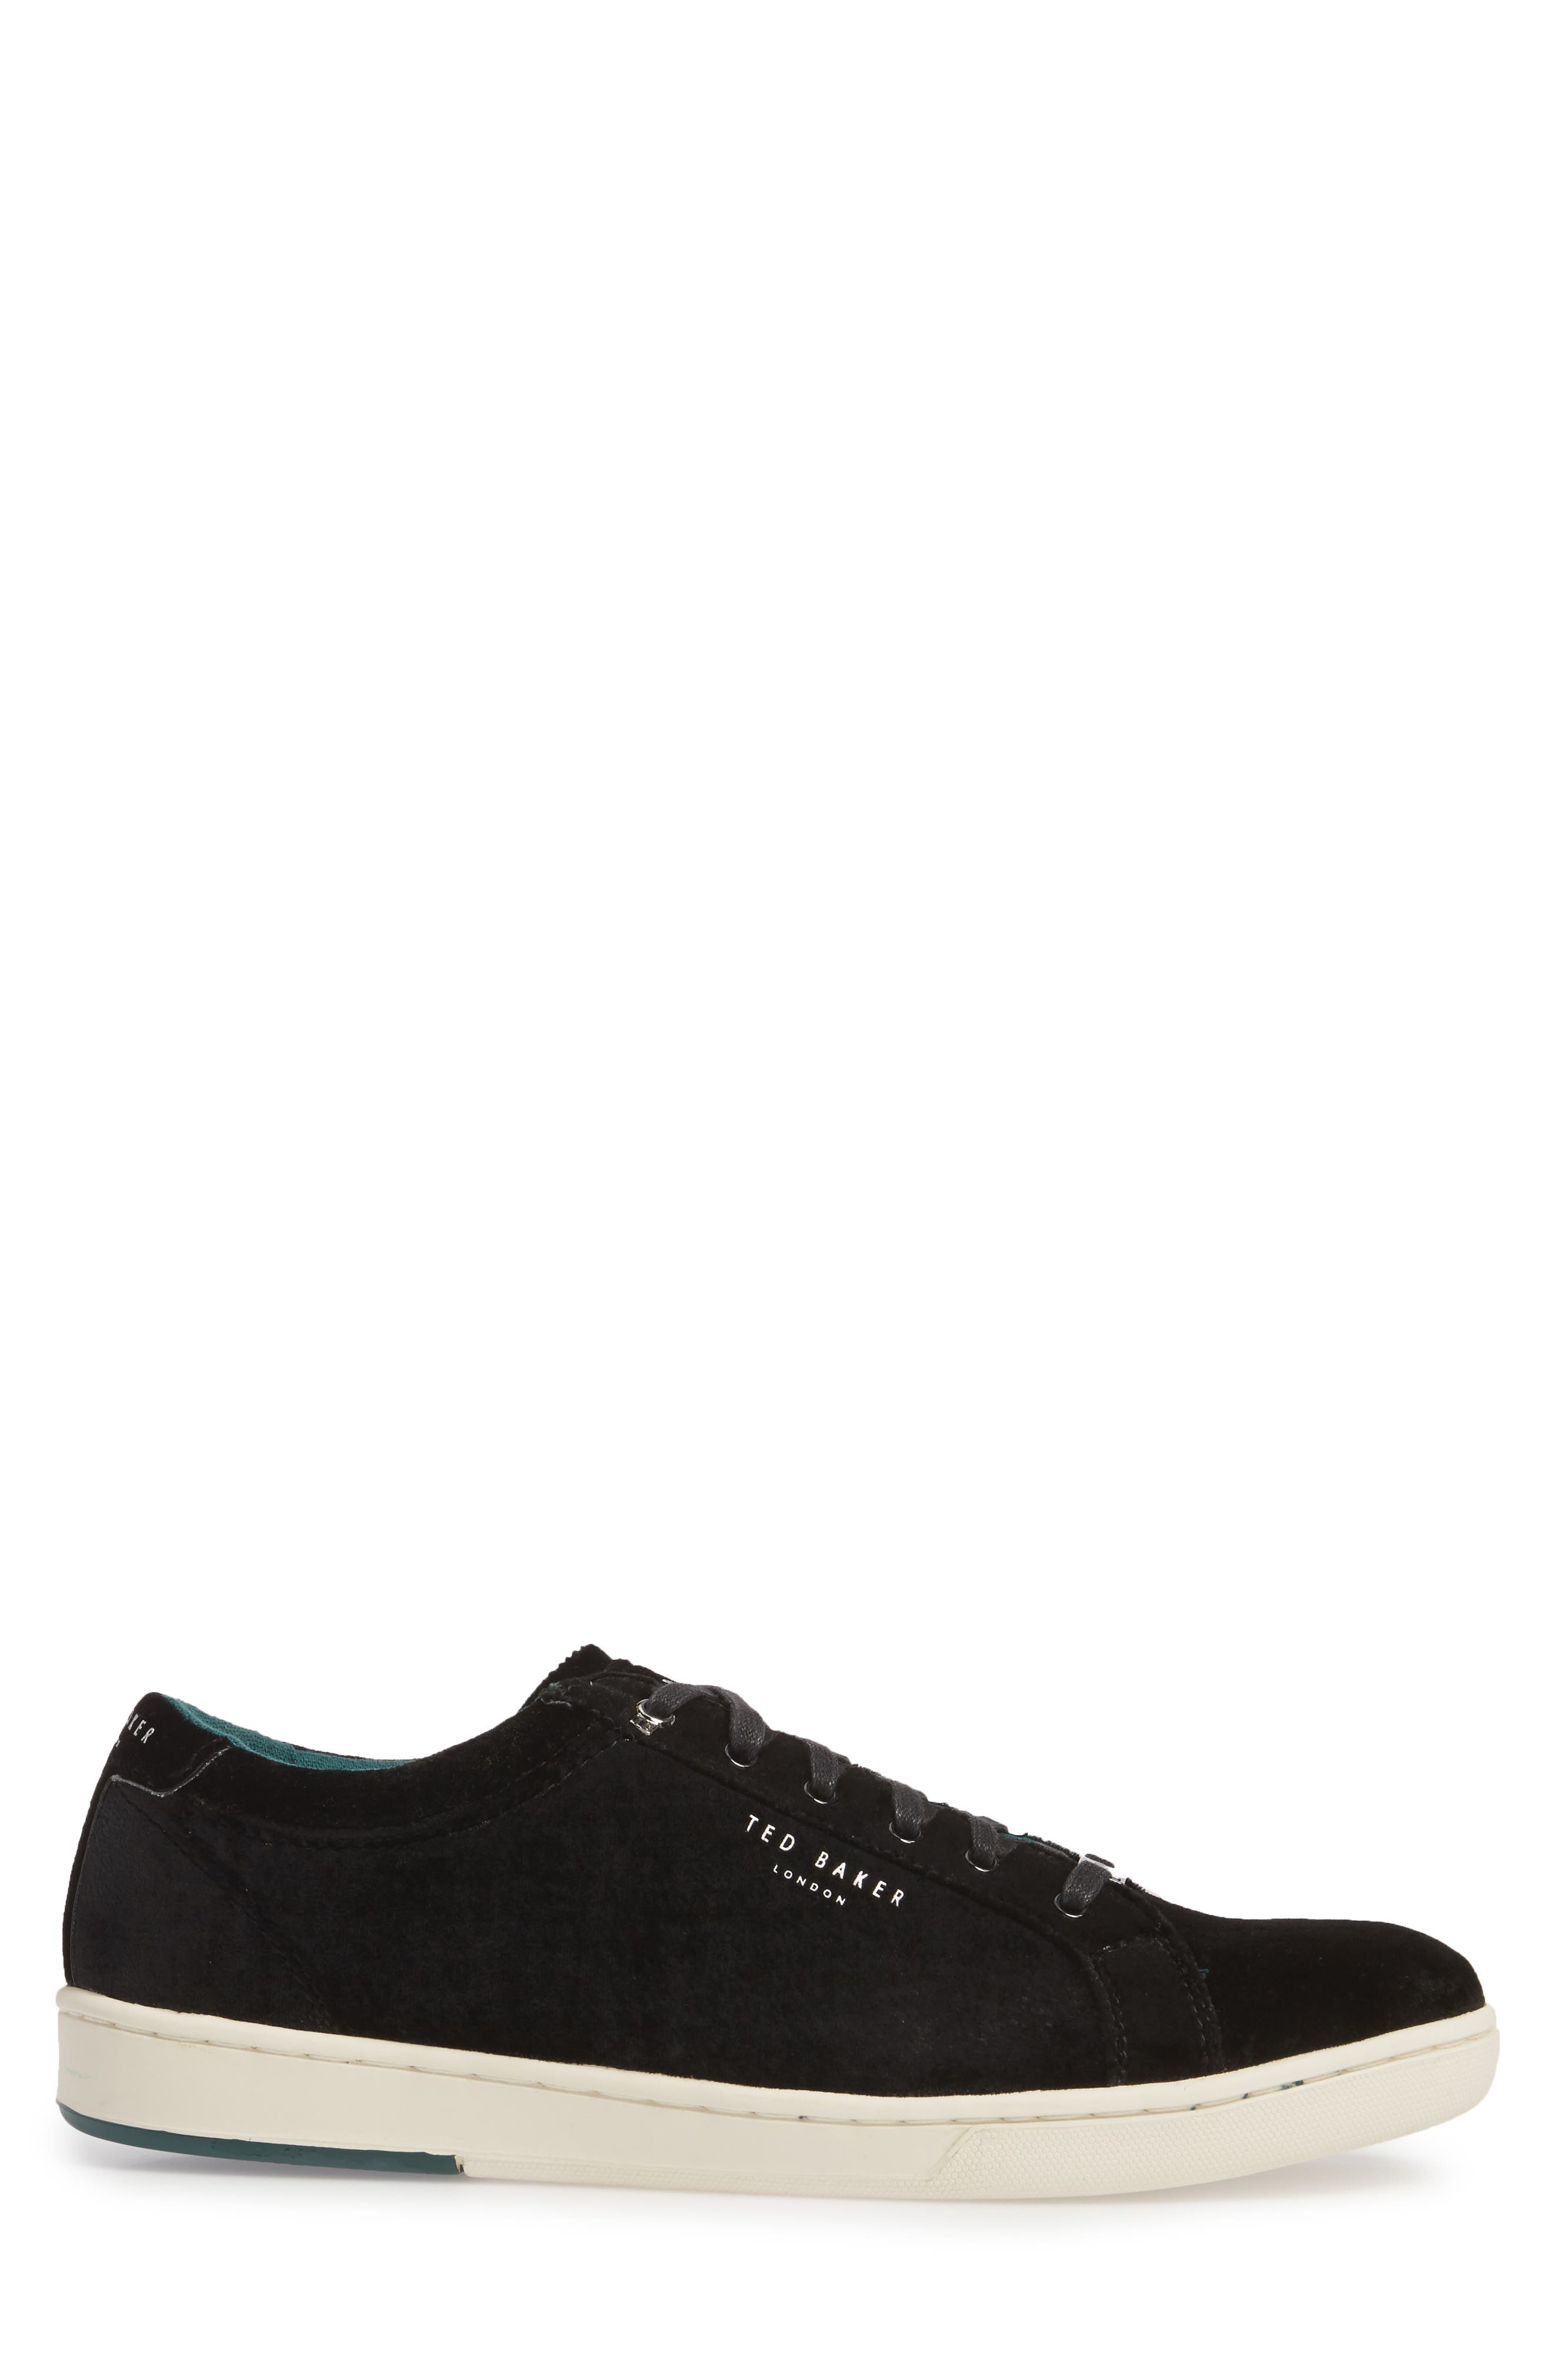 Lambrt Sneaker,                             Alternate thumbnail 3, color,                             Black